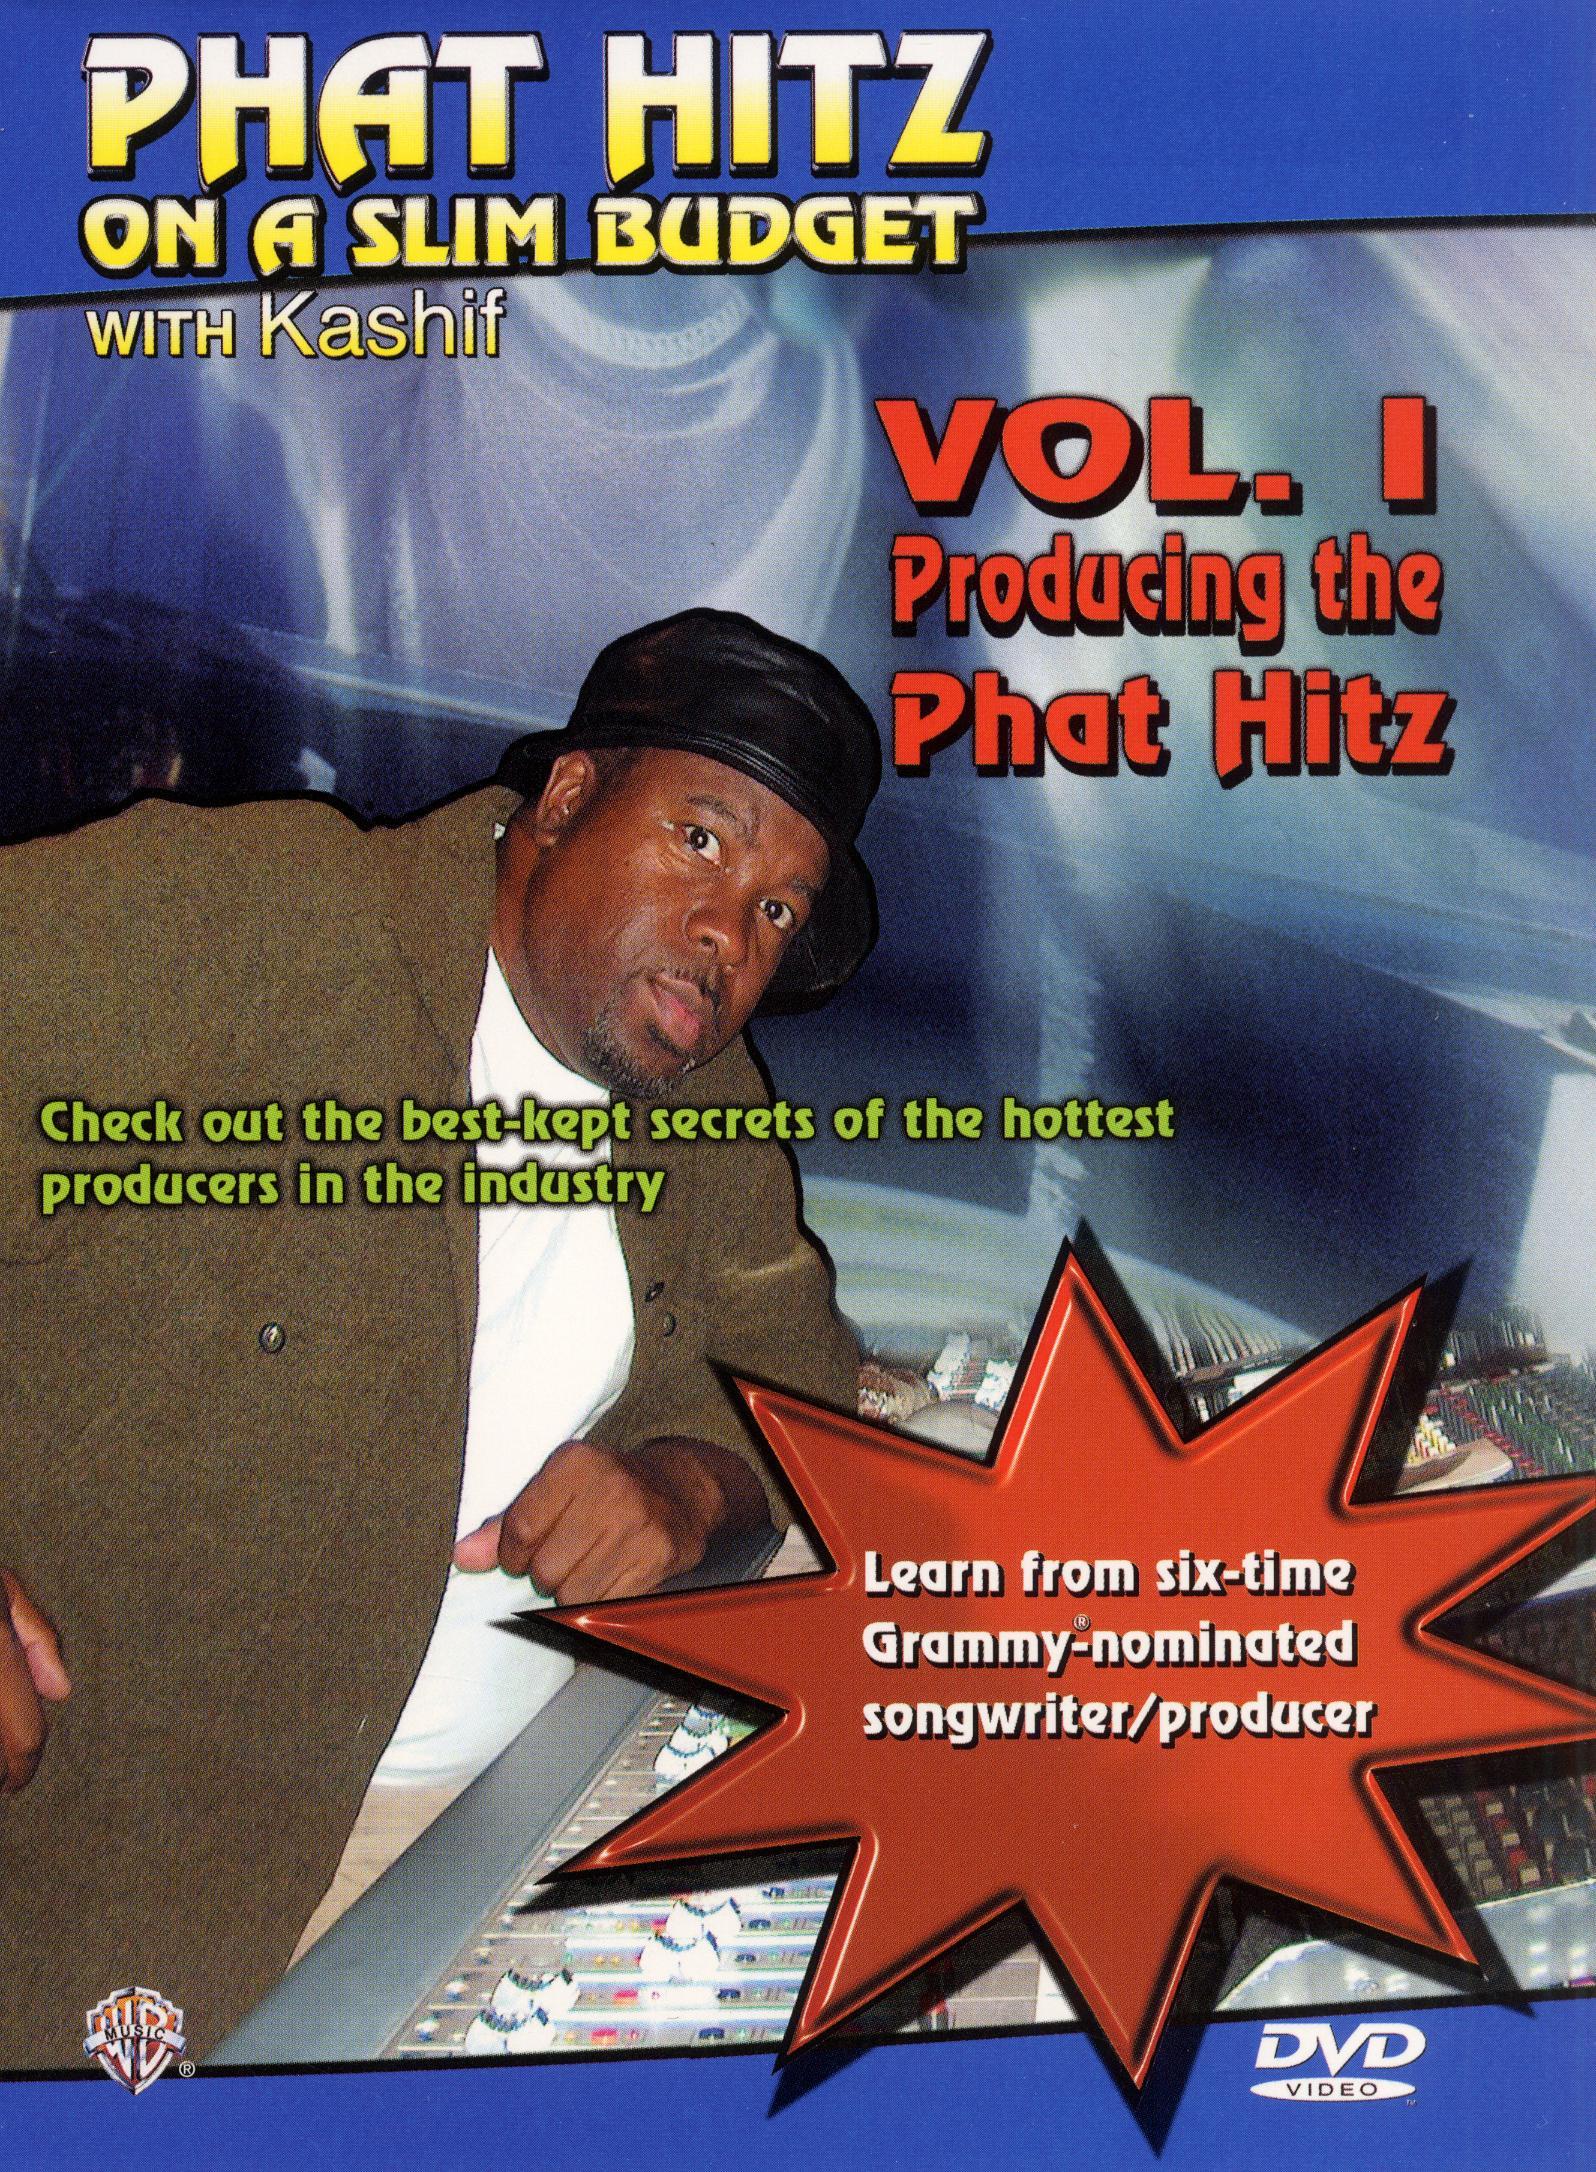 Producing the Phat Hitz, Vol. 1